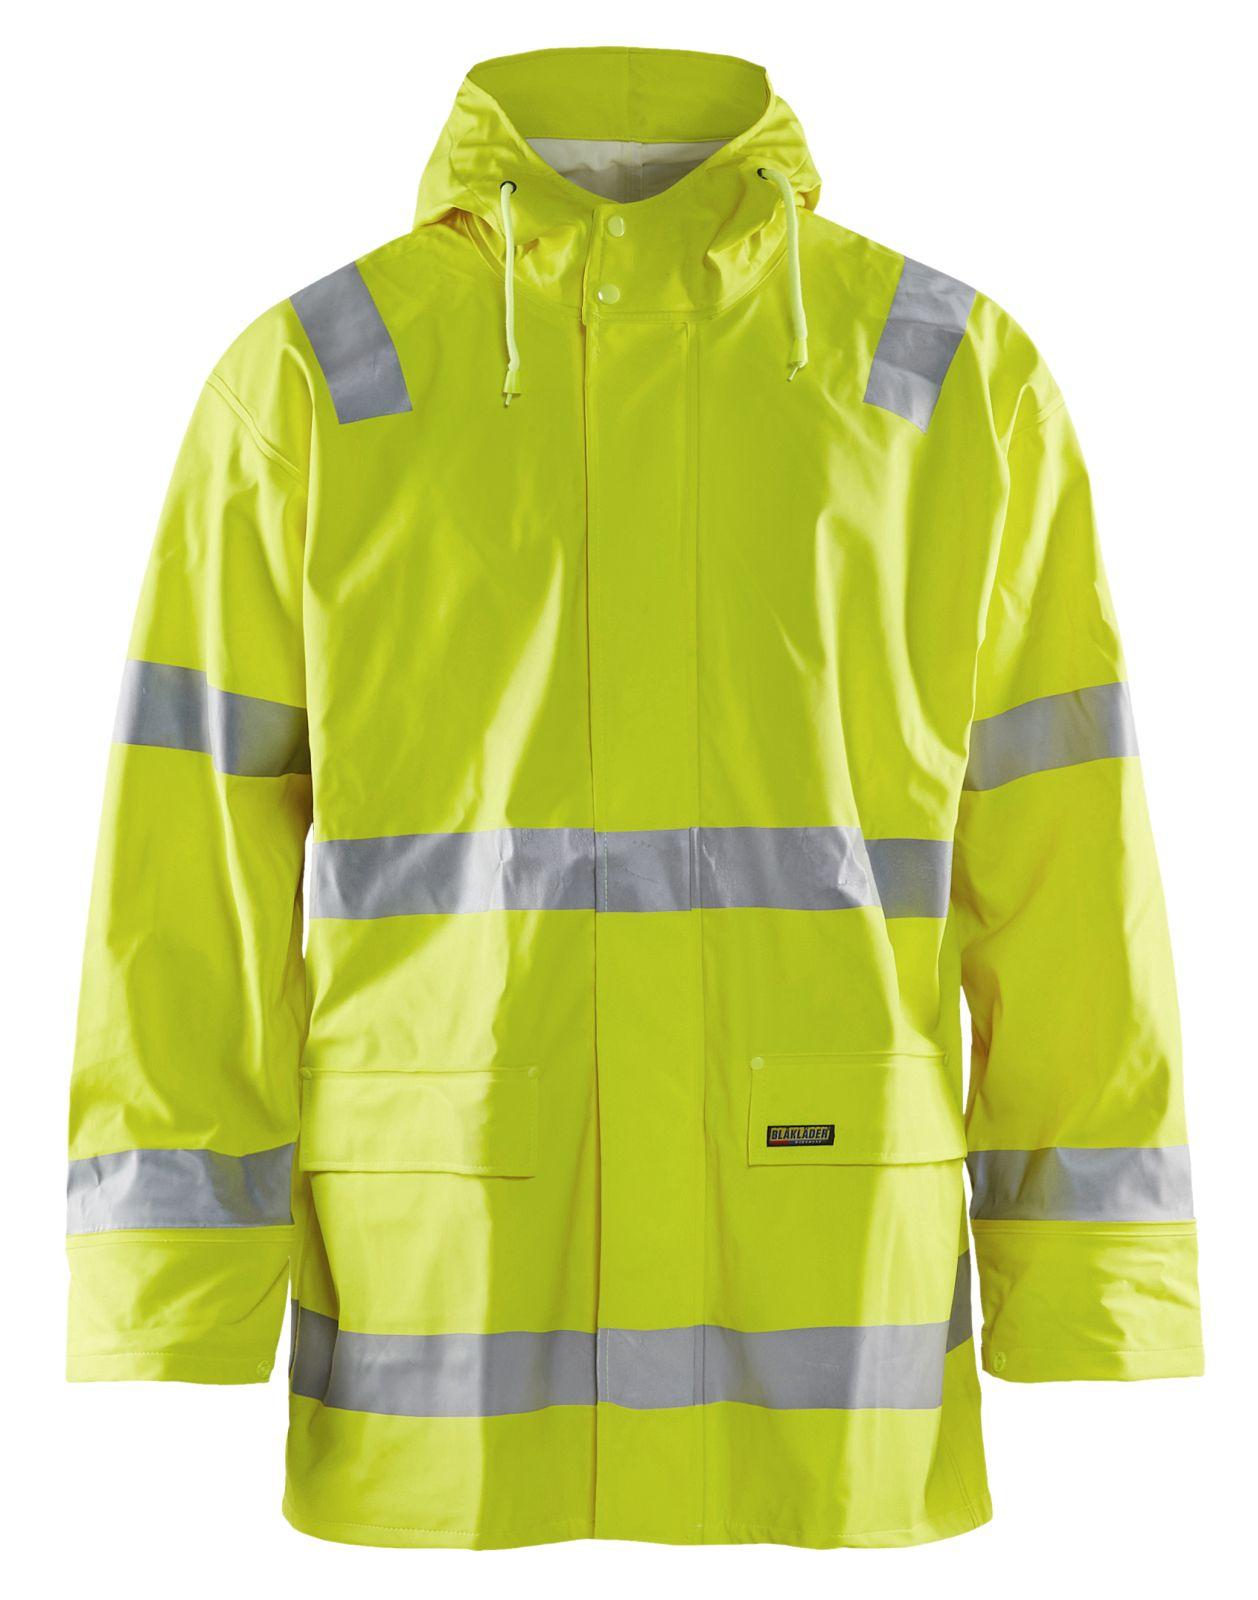 Blaklader Regenjassen 43262005 High Vis fluo-geel(3300)